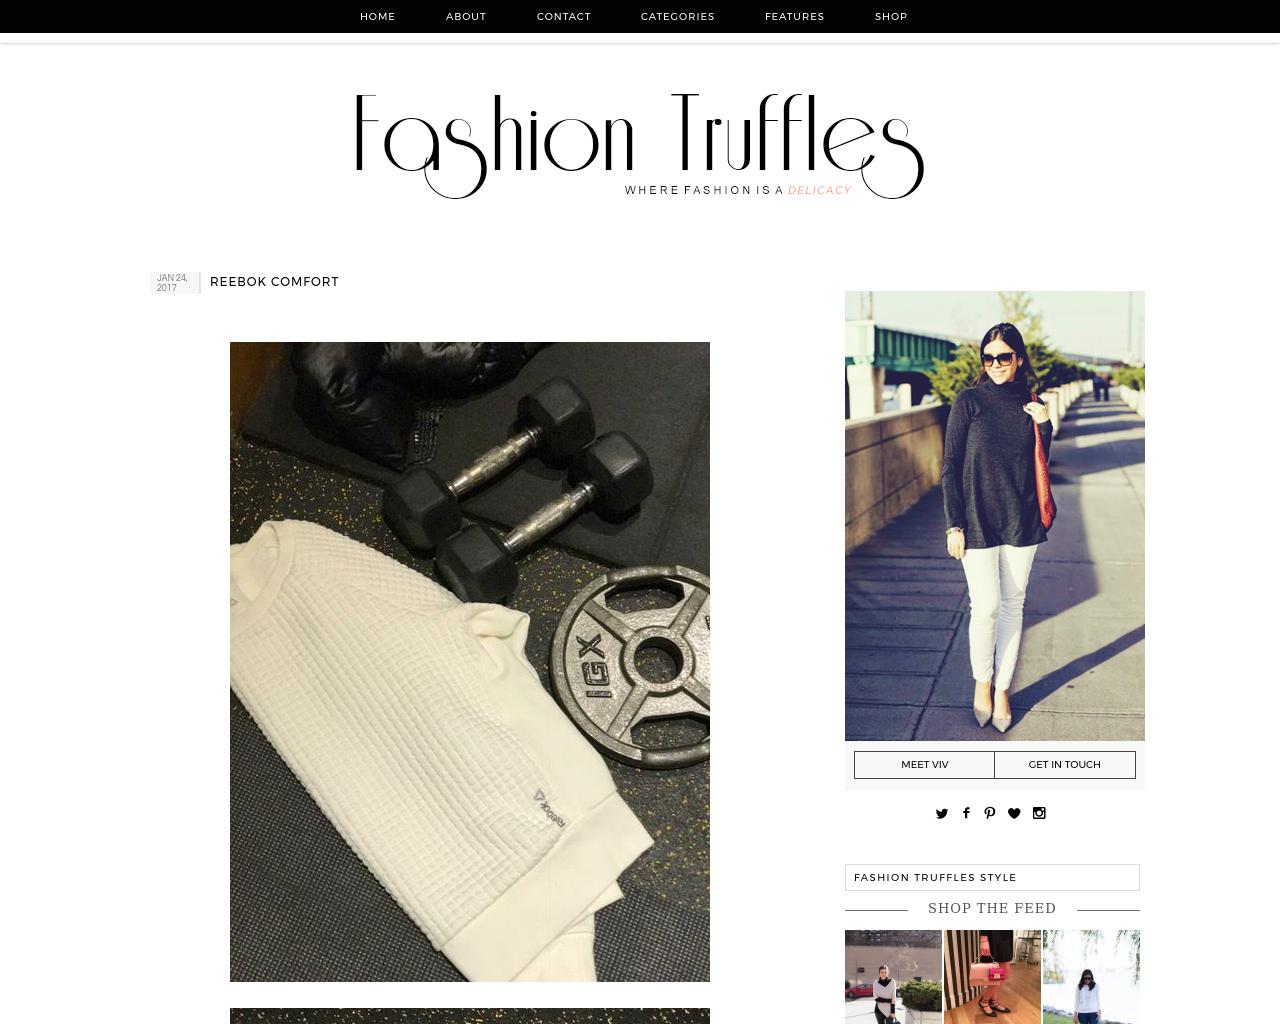 Fashion-Truffles-Advertising-Reviews-Pricing